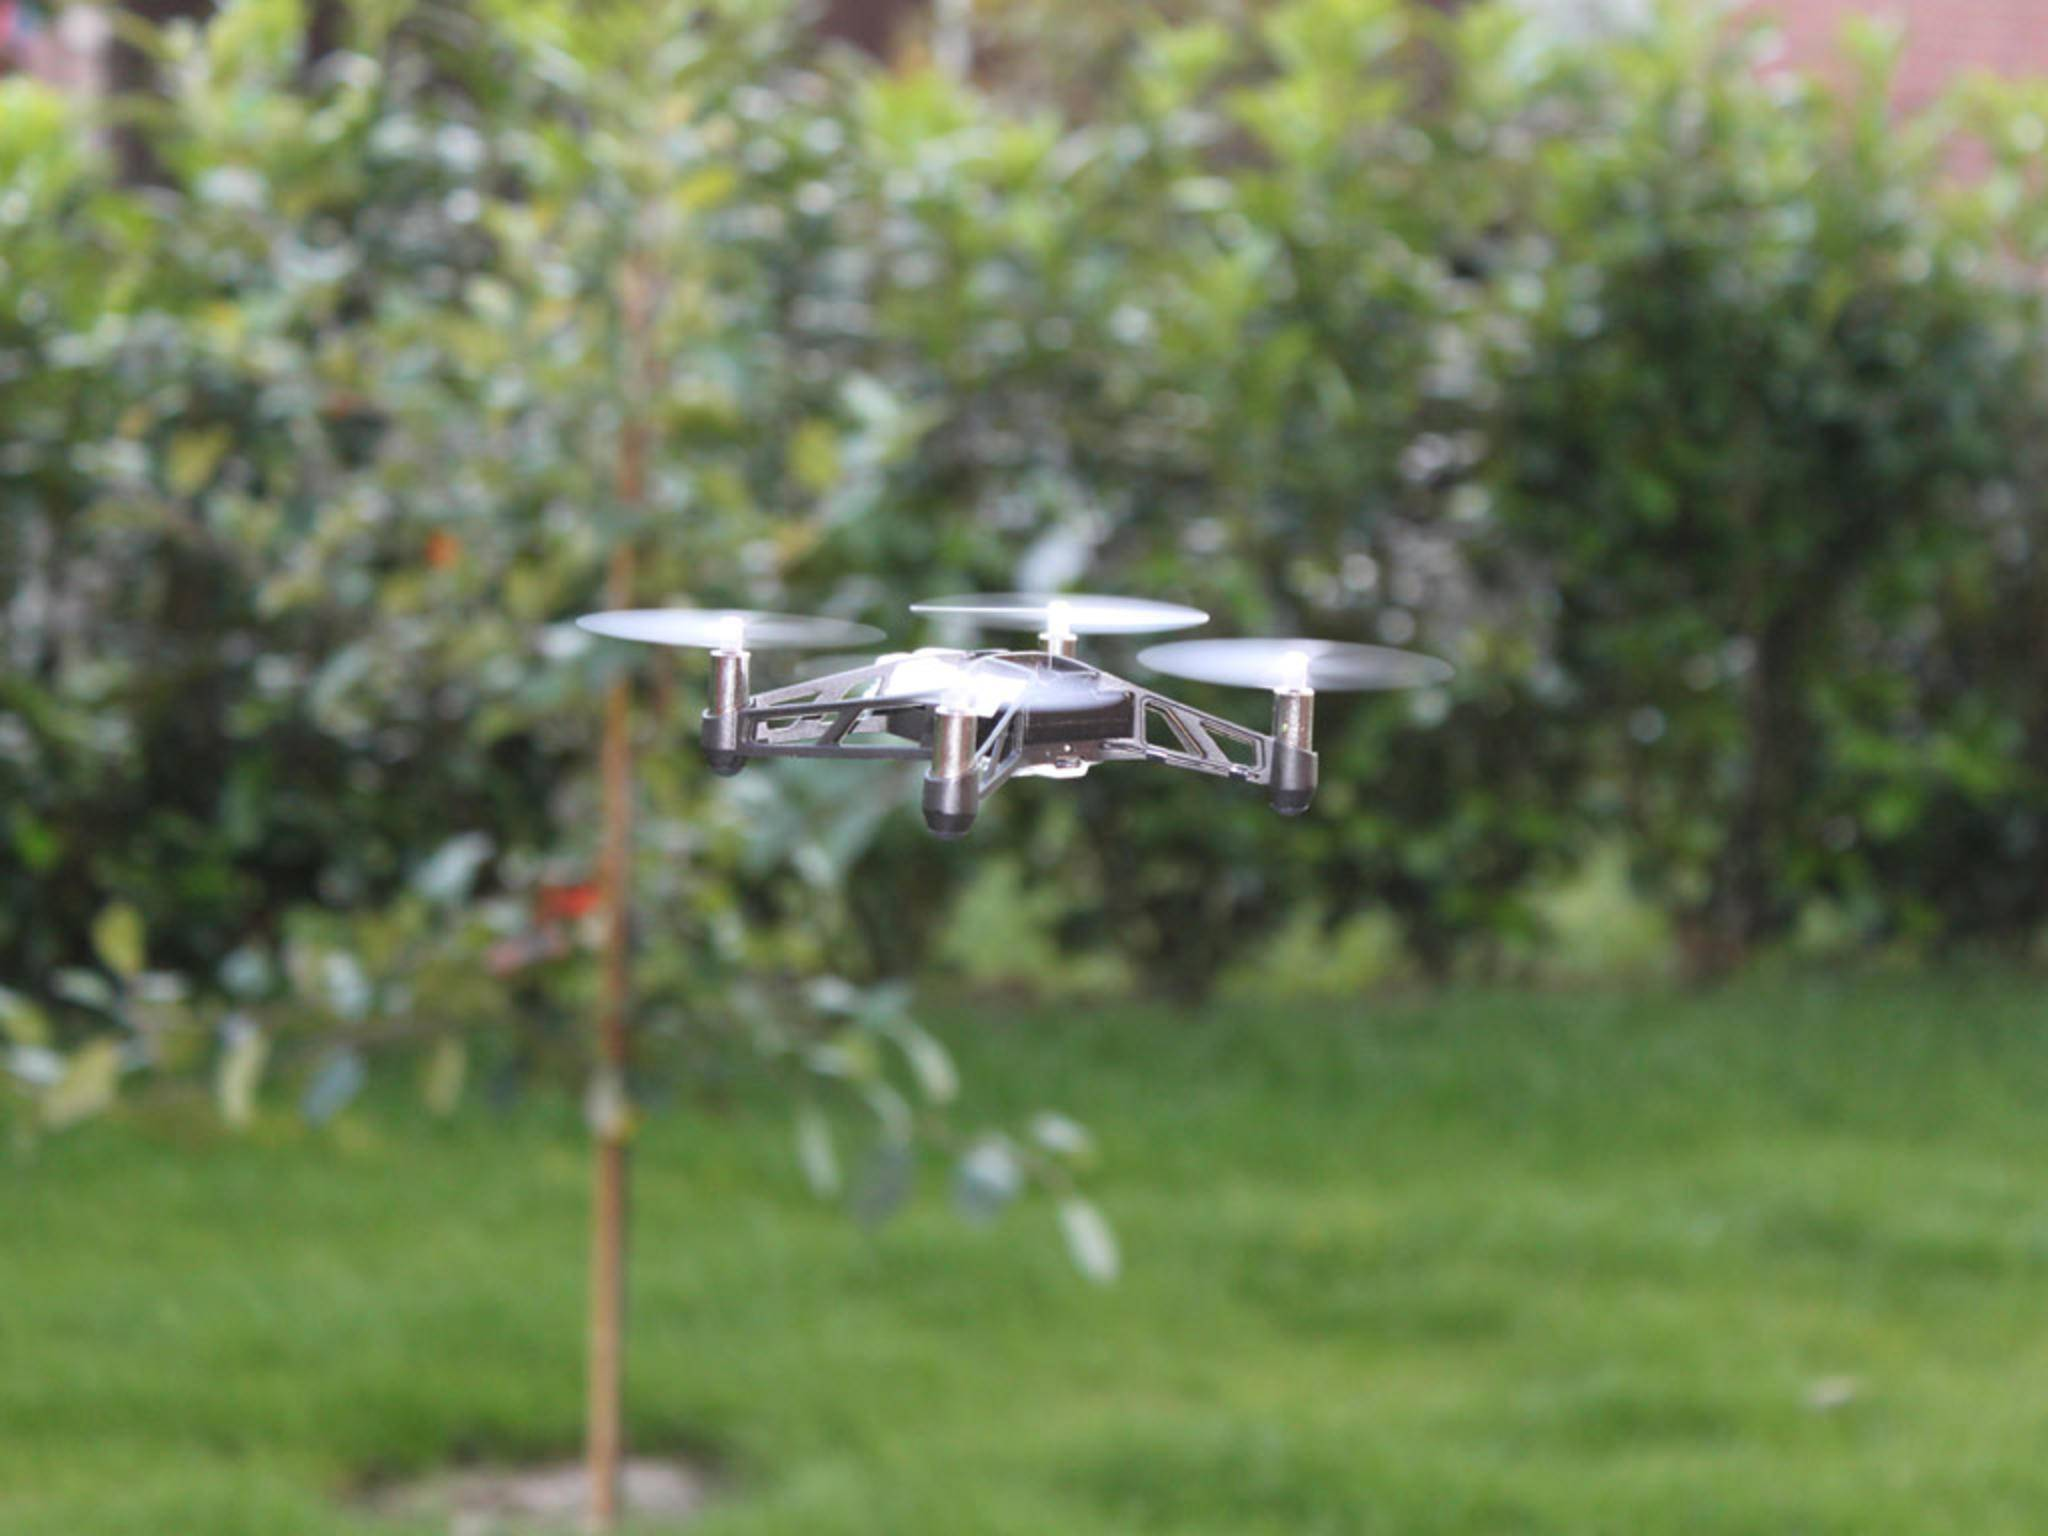 Selbst Loopings beherrscht der Quadcopter mühelos.